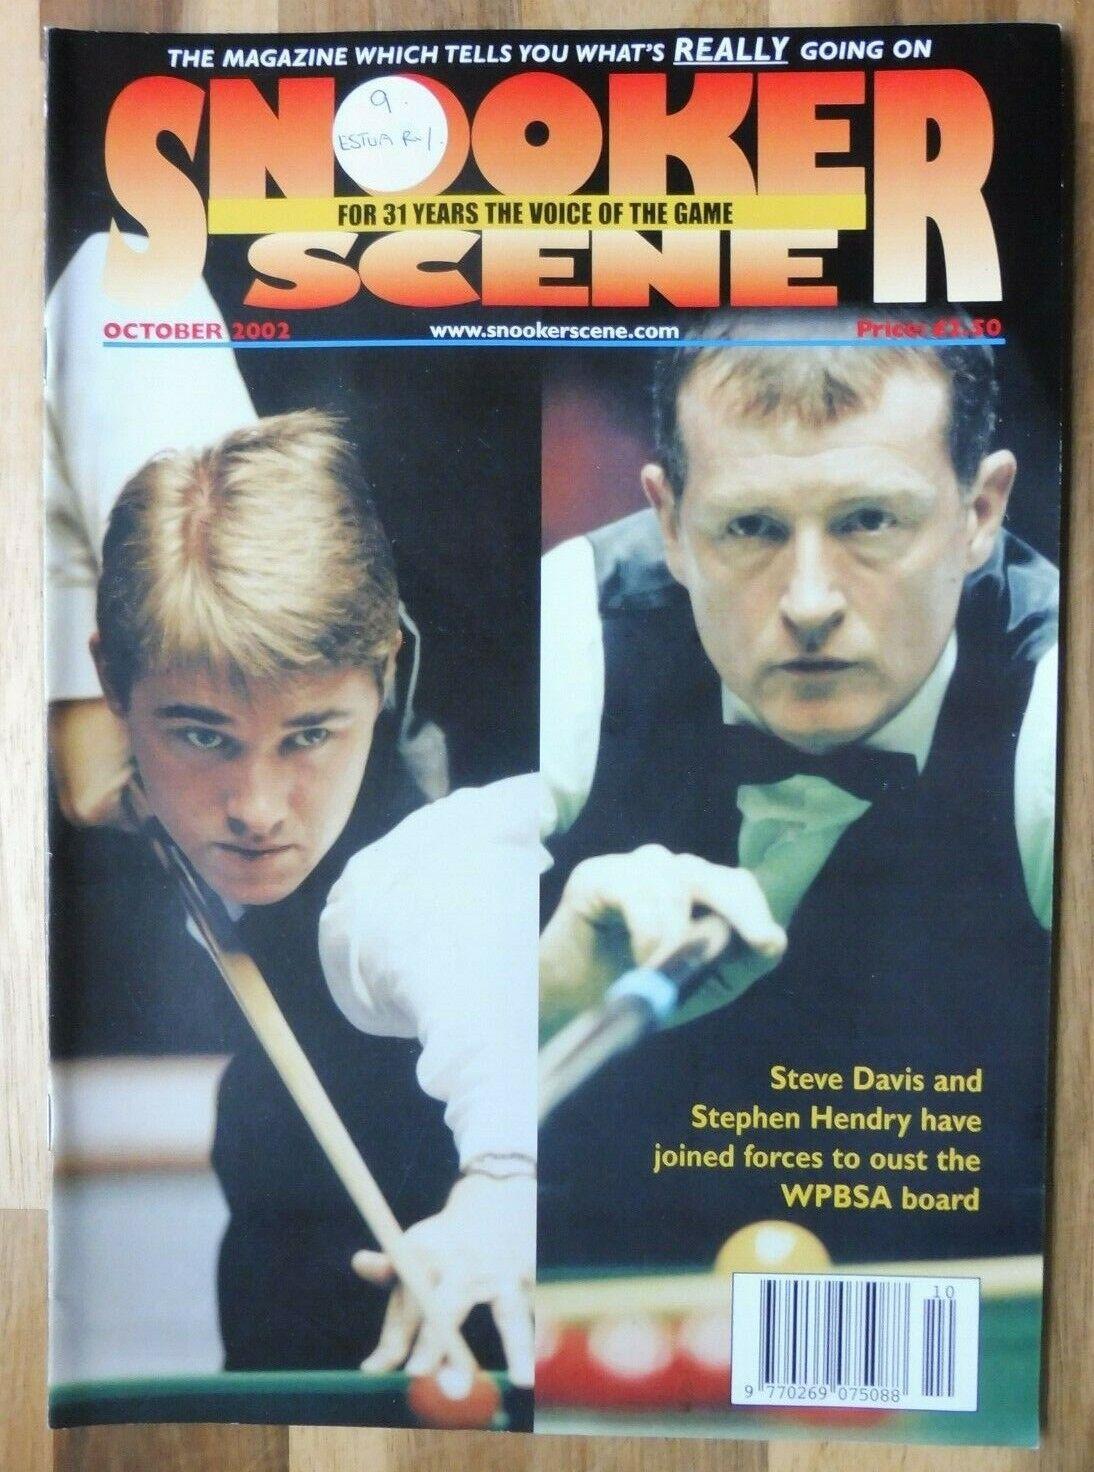 Snooker Scene Magazine, October 2002, Good Condition.